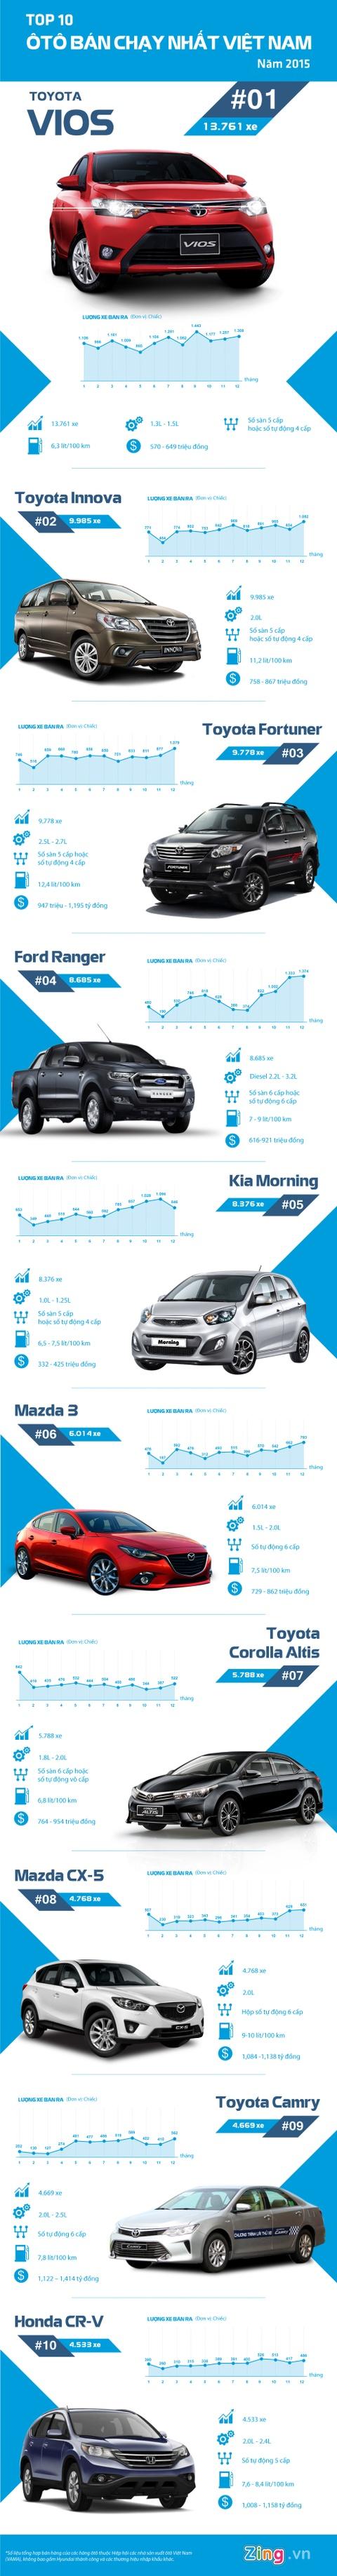 Toyota thong tri top 10 oto ban chay tai Viet Nam 2015 hinh anh 1